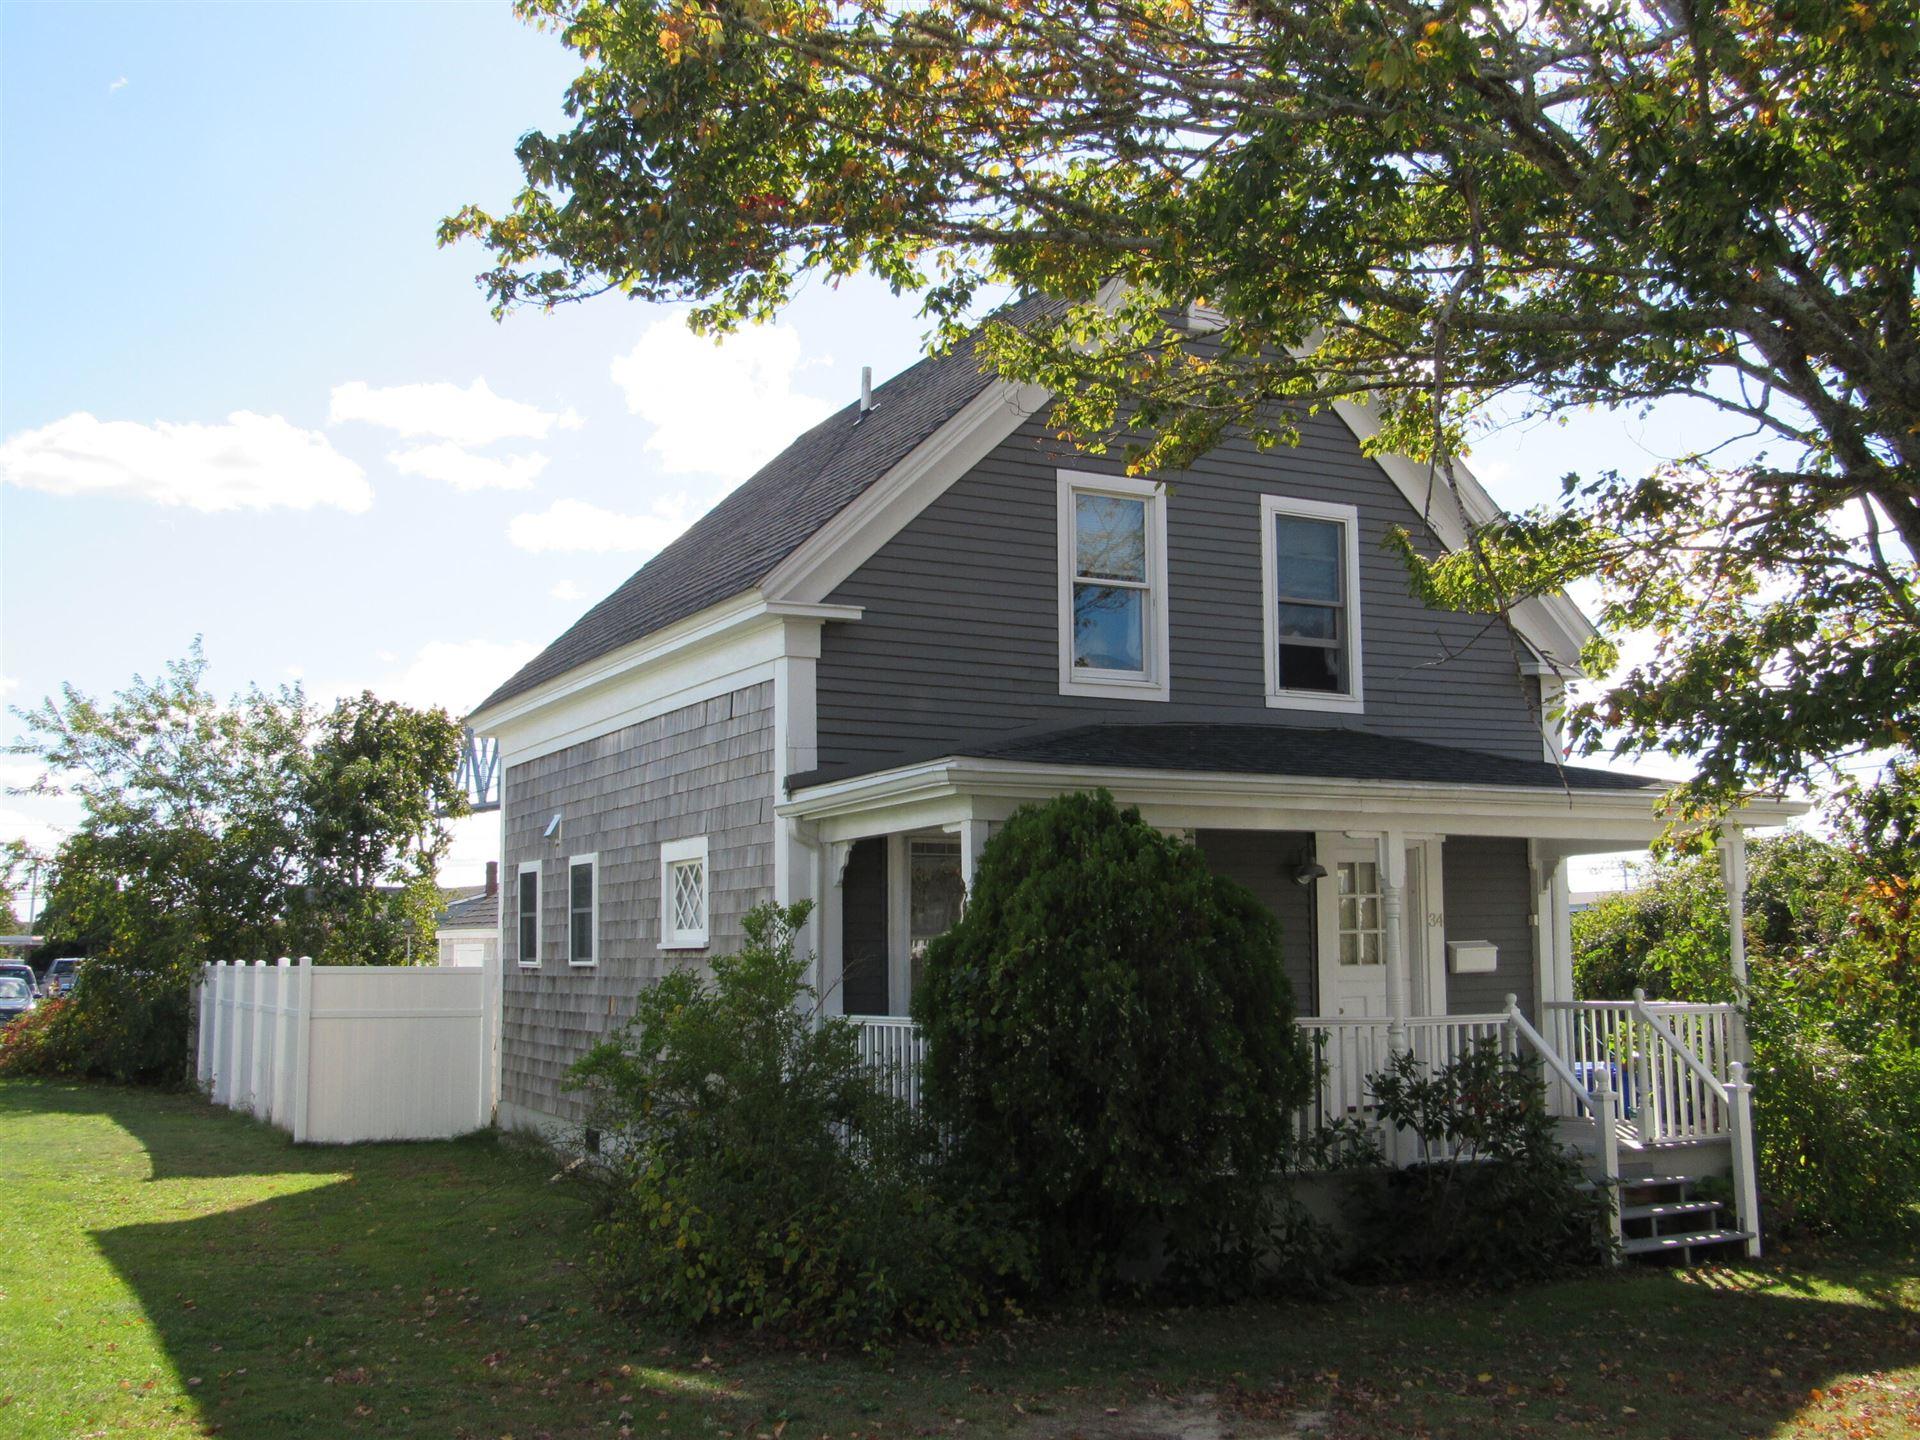 Photo of 34 Cohasset Avenue, Buzzards Bay, MA 02532 (MLS # 22106428)